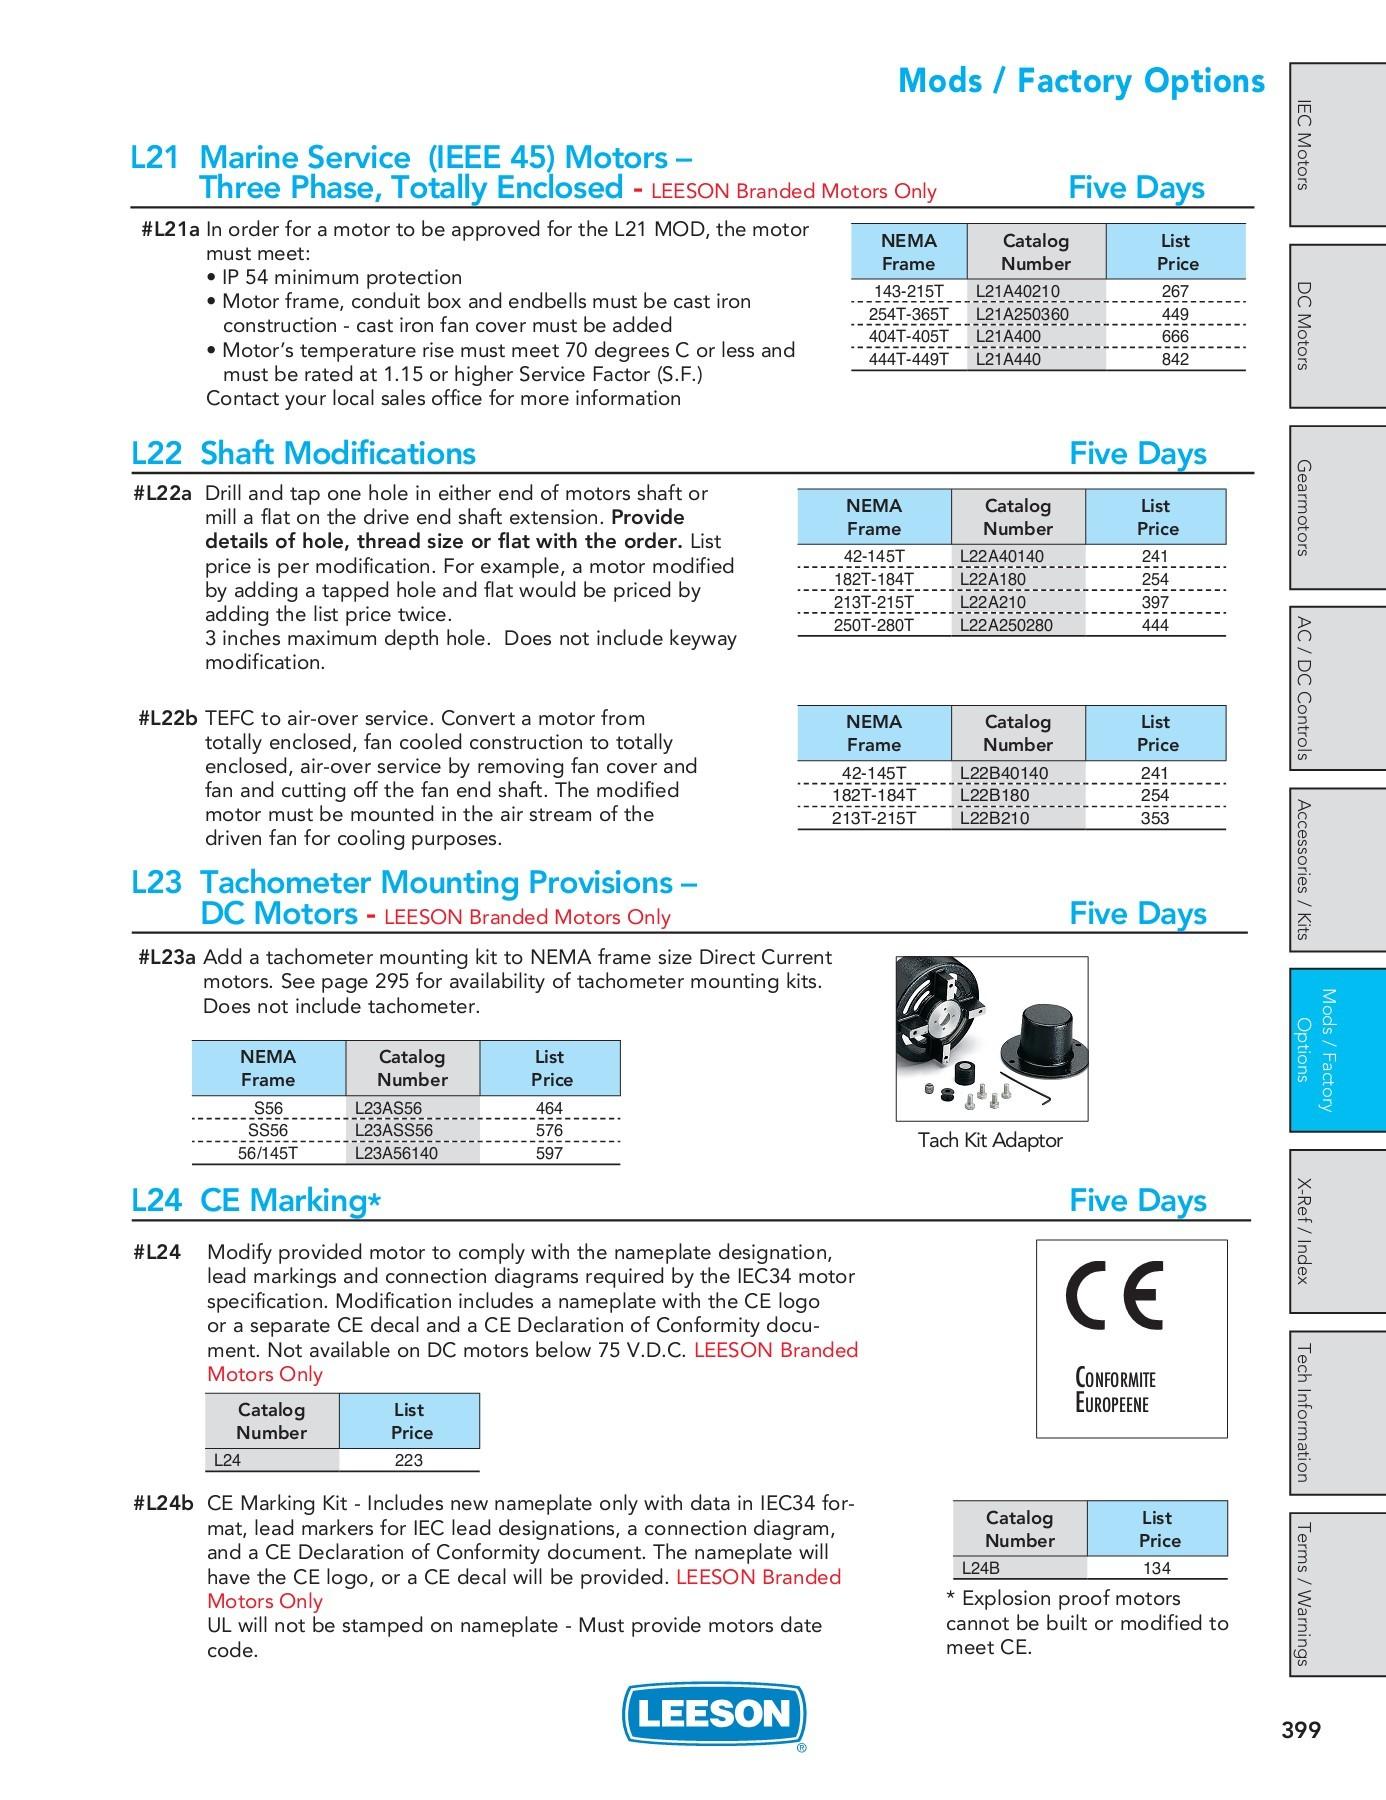 Dayton 6k241b Wiring Diagram on ac motor wiring diagram, gear motor wiring diagram, simple dc motor diagram, electric linear actuator wiring diagram, electric motors wiring diagram, dc electric motor diagram, dc motor schematic, pwm wiring diagram, dc motor wiring connection, dc motor control circuit, relays wiring diagram, baldor motors wiring diagram, power supply wiring diagram, induction motor wiring diagram, dc motor control coil, 12 volt actuator wiring diagram, dc motor cable diagram, variable frequency drives wiring diagram, synchronous motor wiring diagram, motor controller wiring diagram,